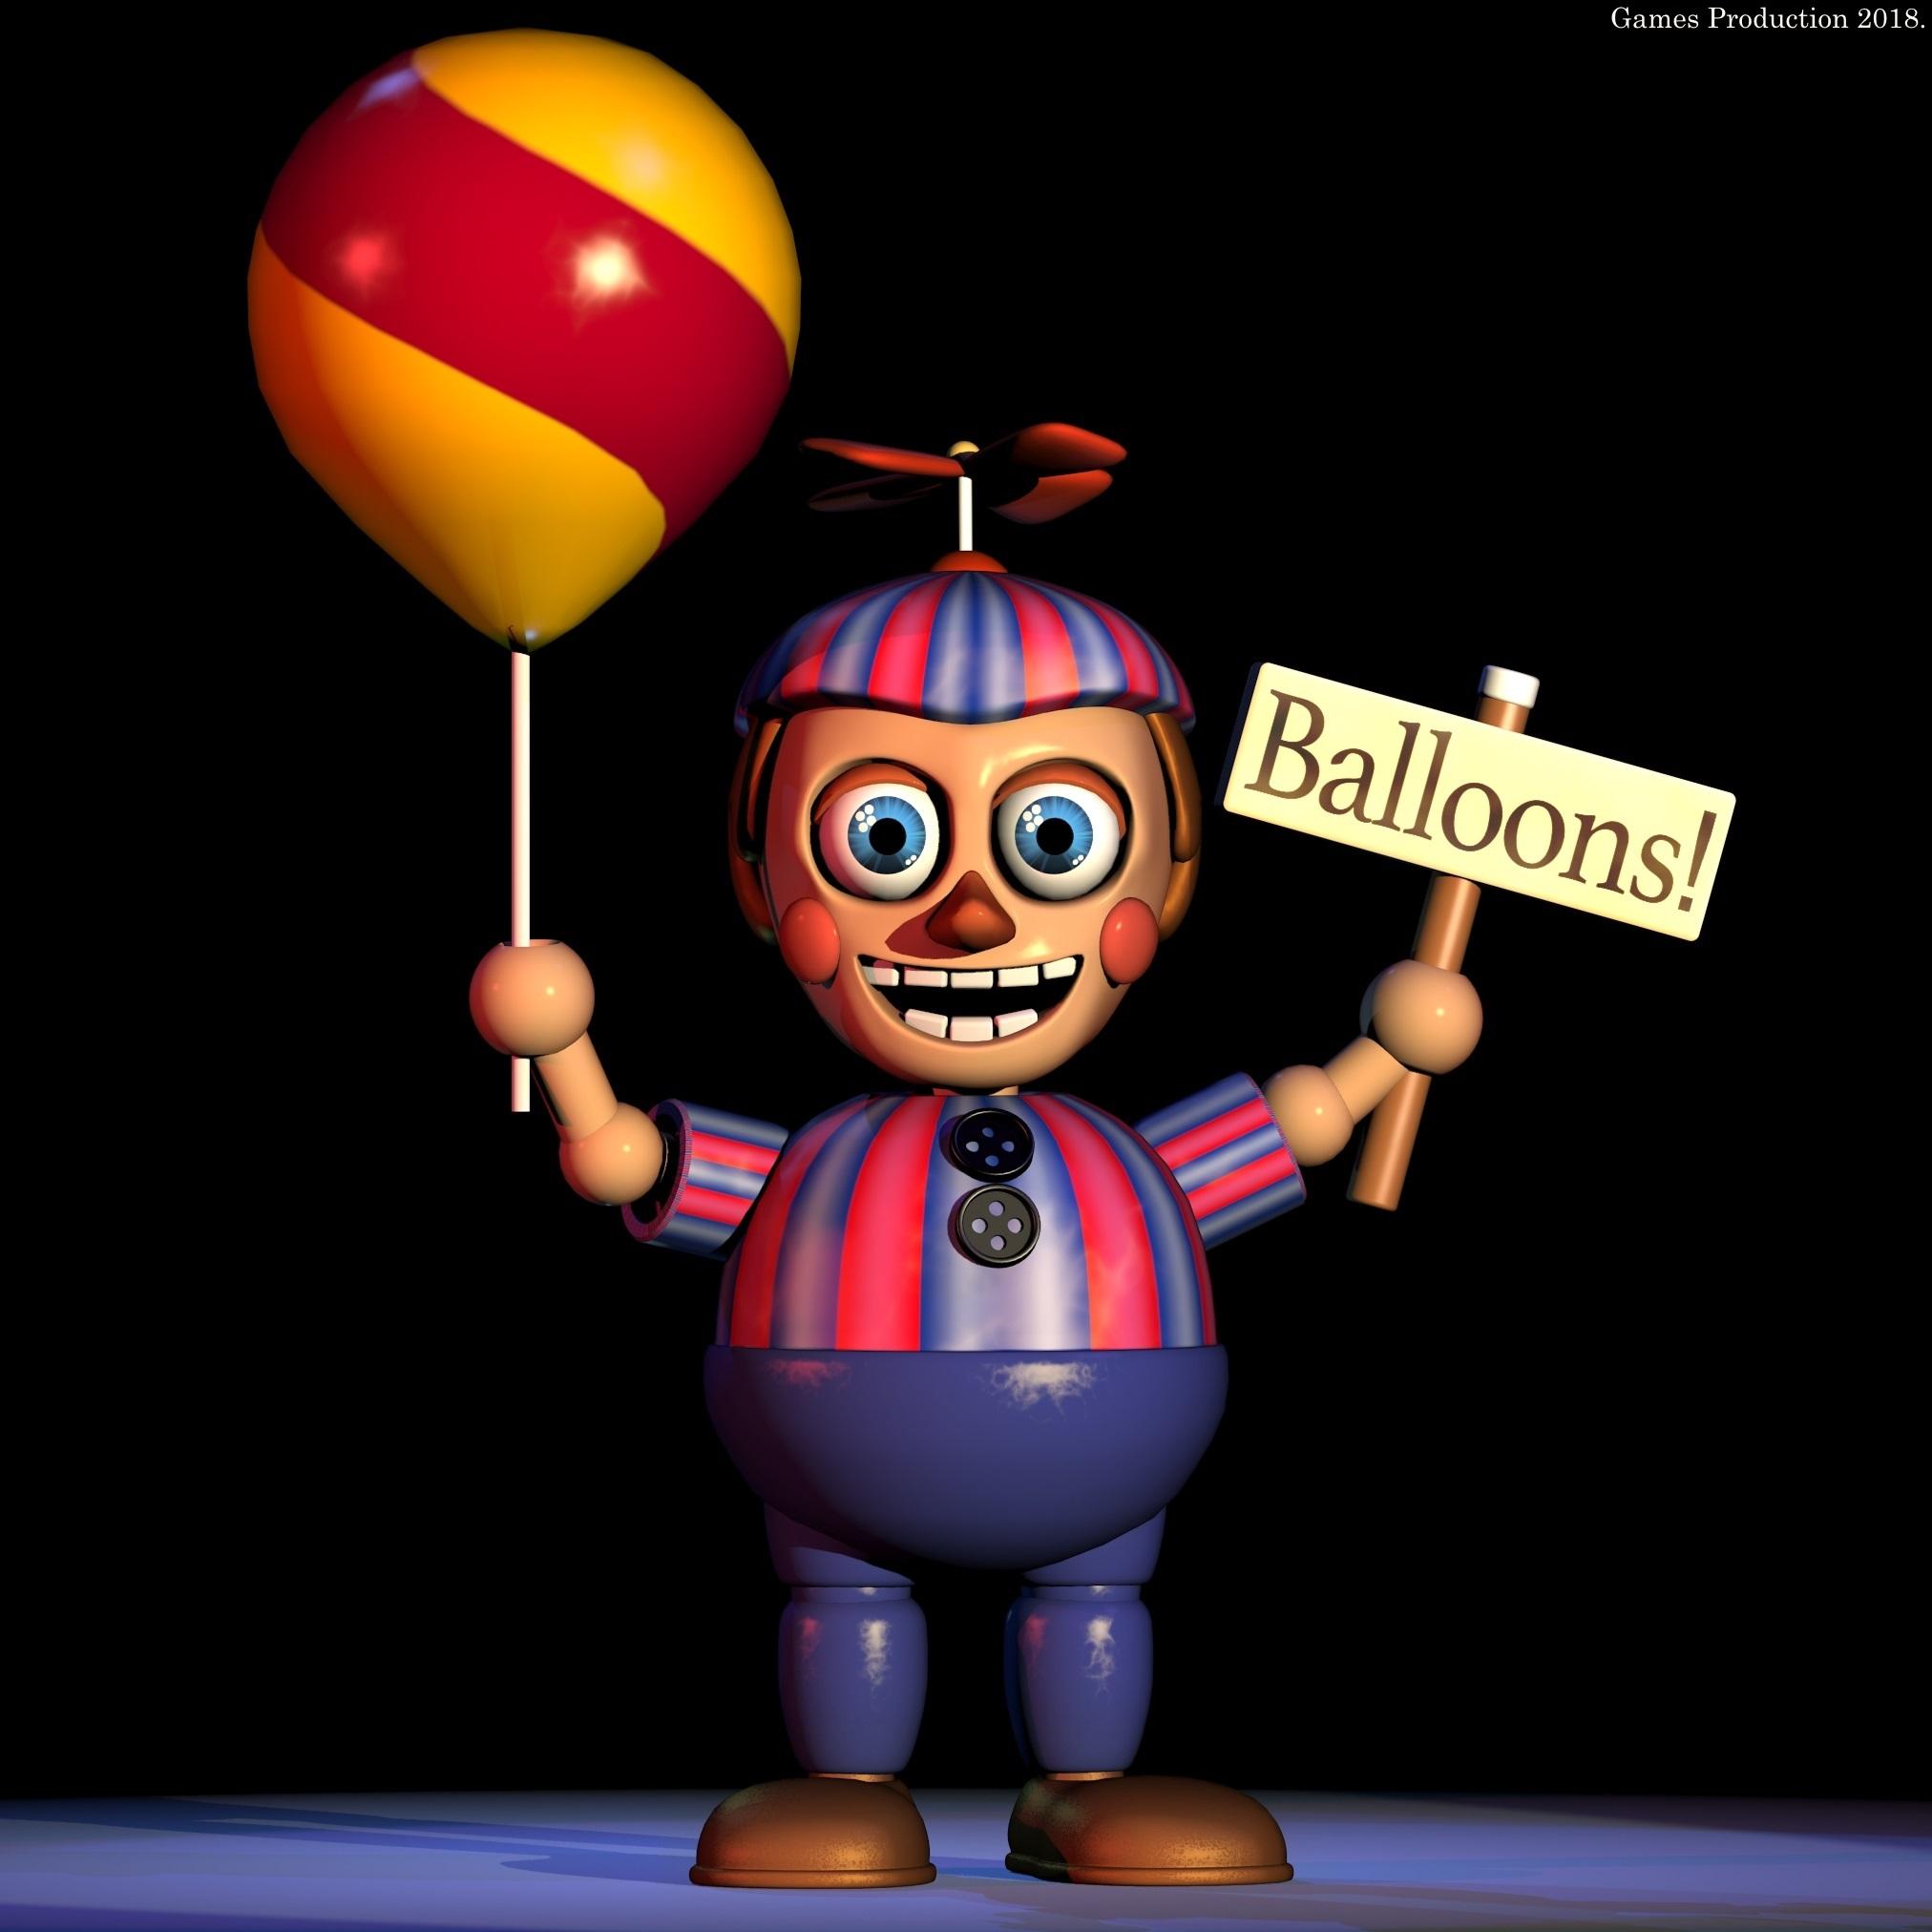 Balloon Boy By GamesProduction On DeviantArt